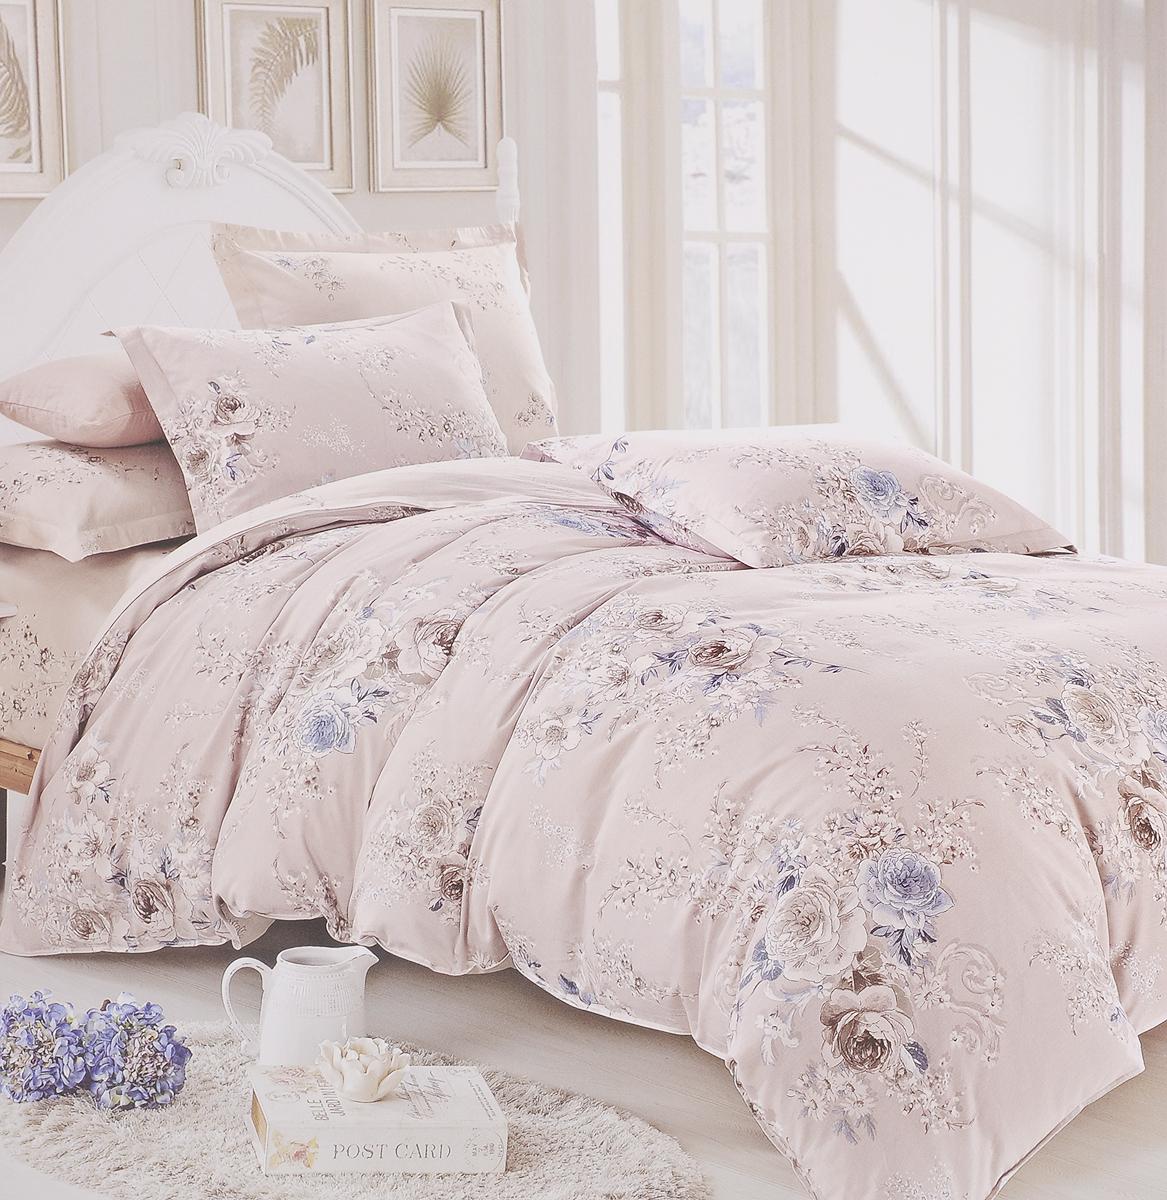 Комплект белья Classic by T Лаура, 2-спальный, наволочки 50х70